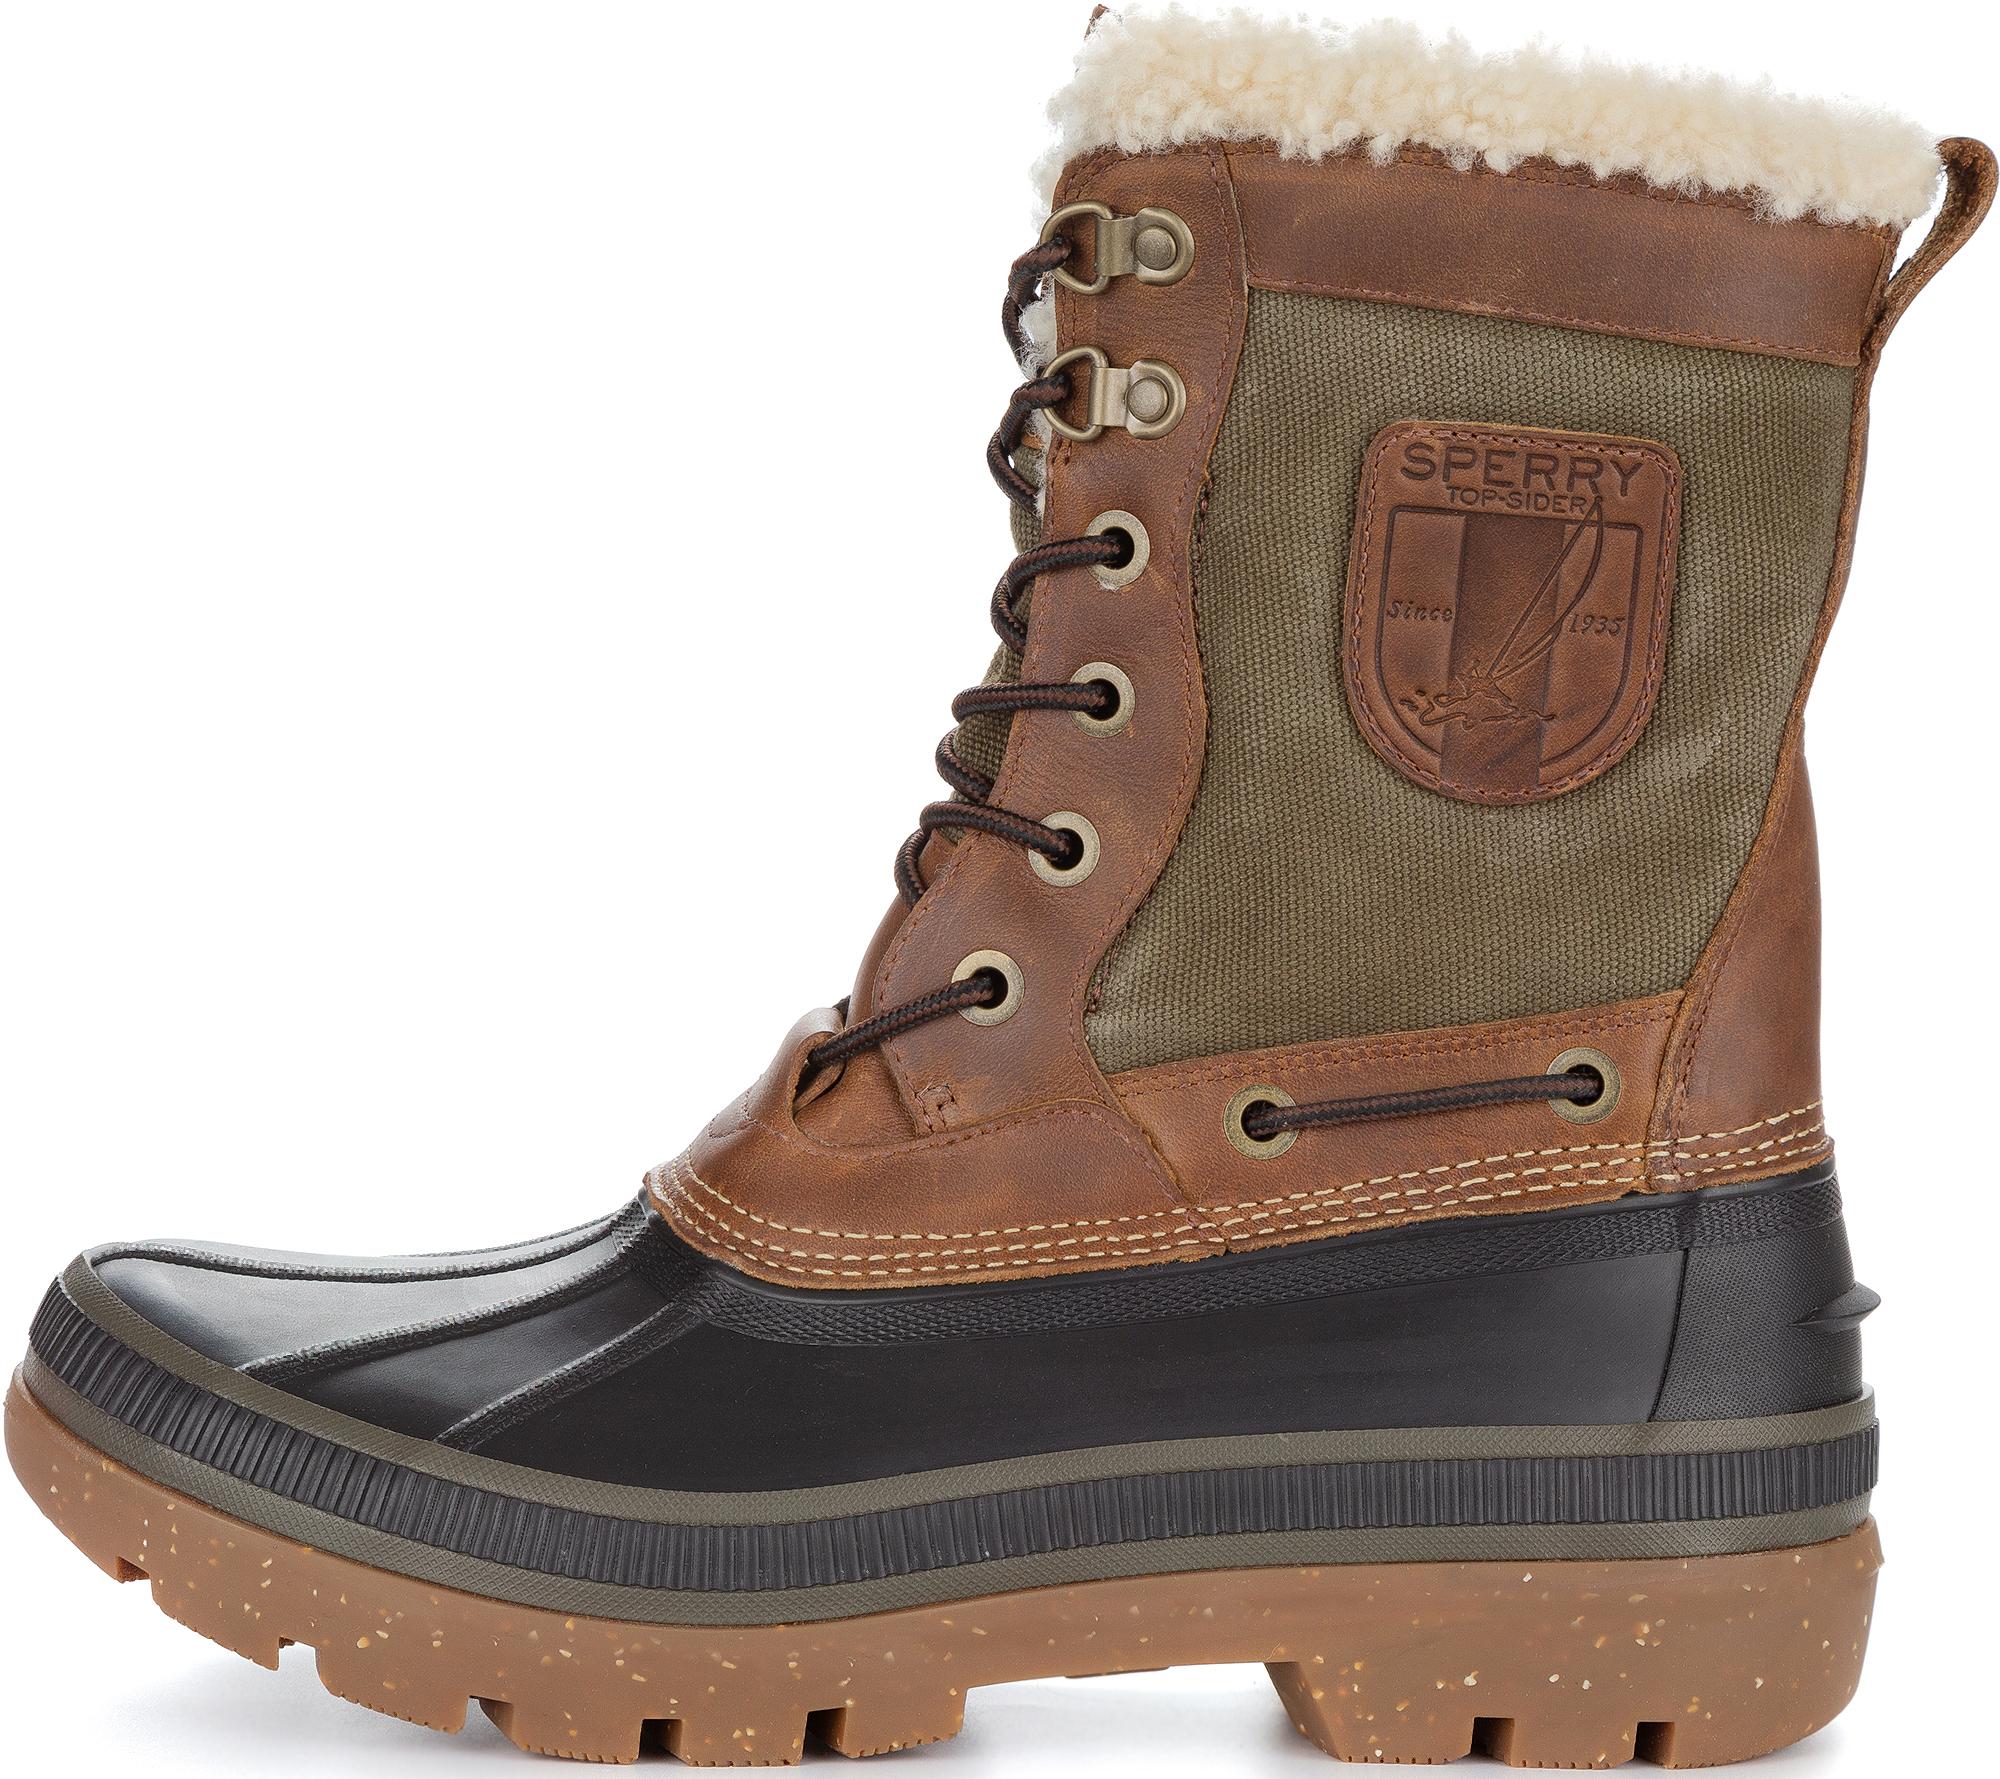 цена Sperry Ботинки утепленные мужские SPERRY Ice Bay Tall Boot, размер 43